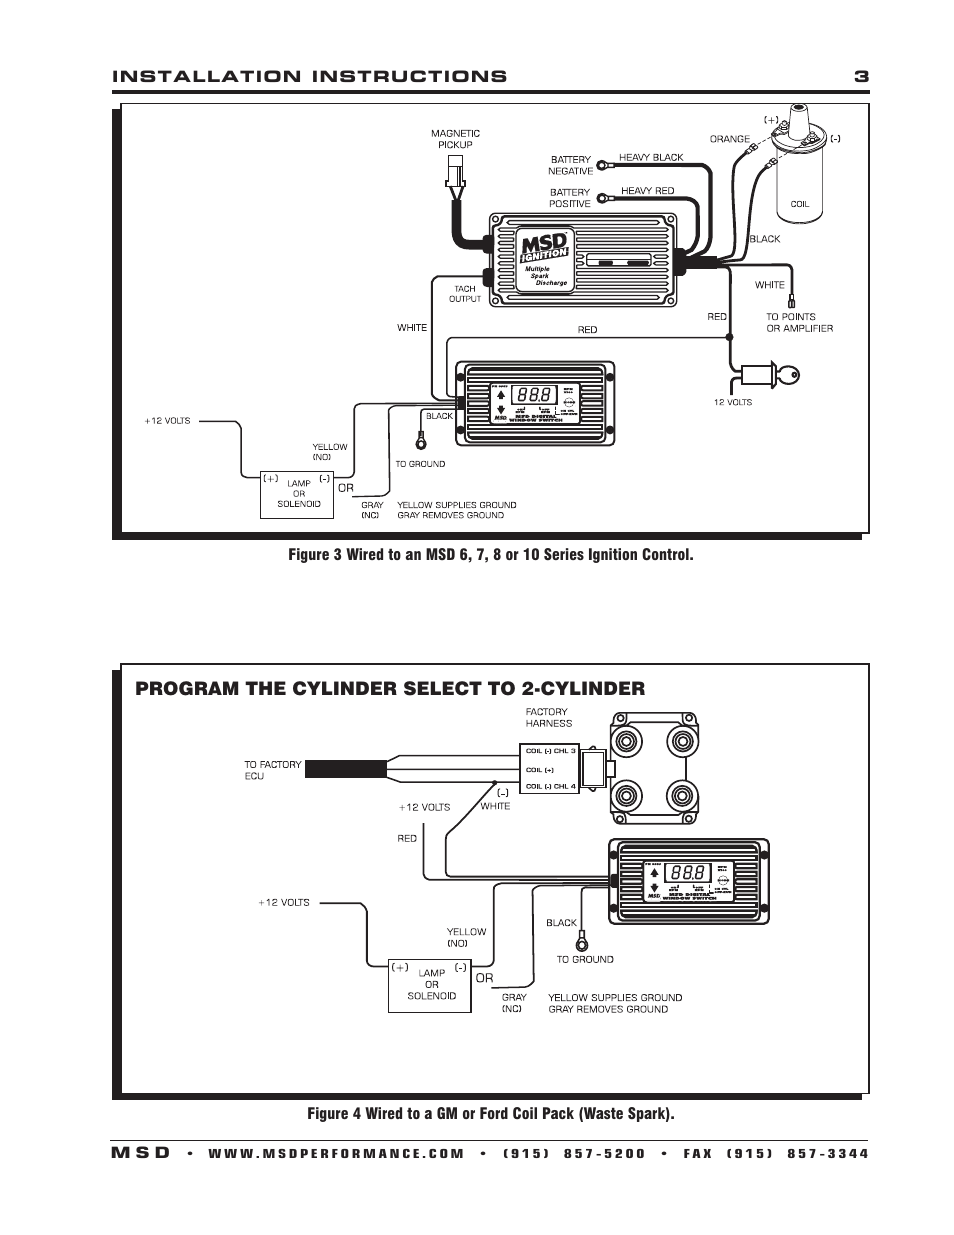 msd 8969 digital rpm window switch installation user